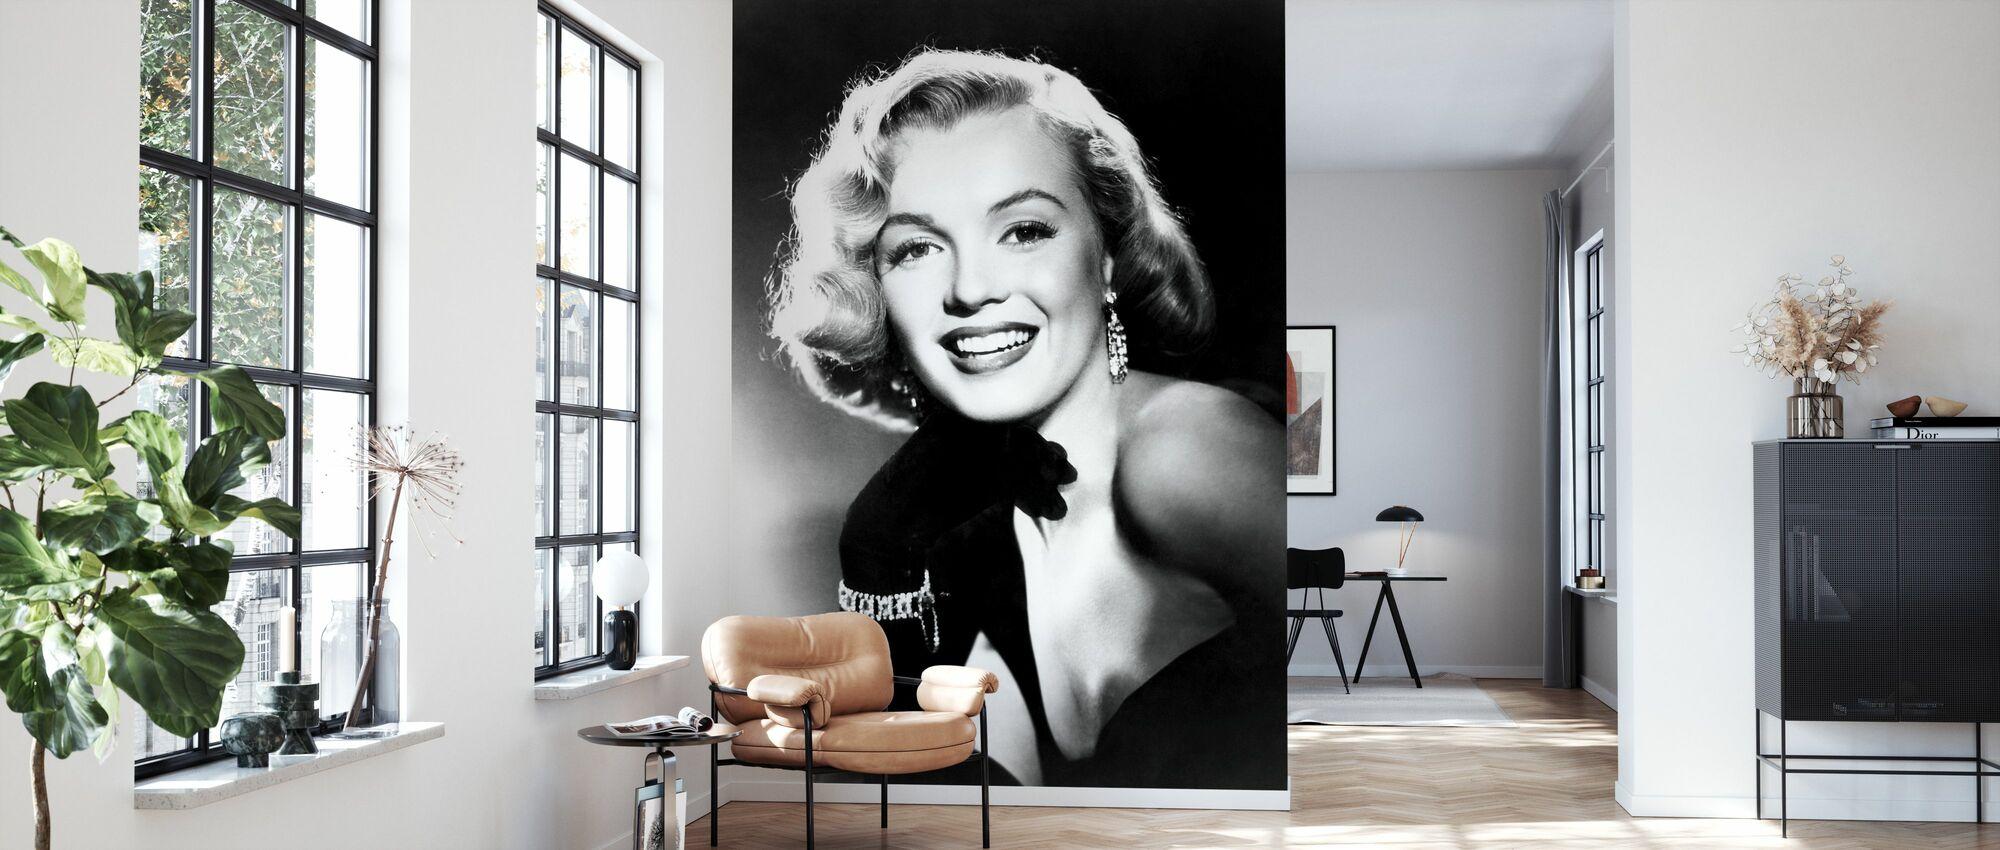 Hollywood's Elite - Wallpaper - Living Room